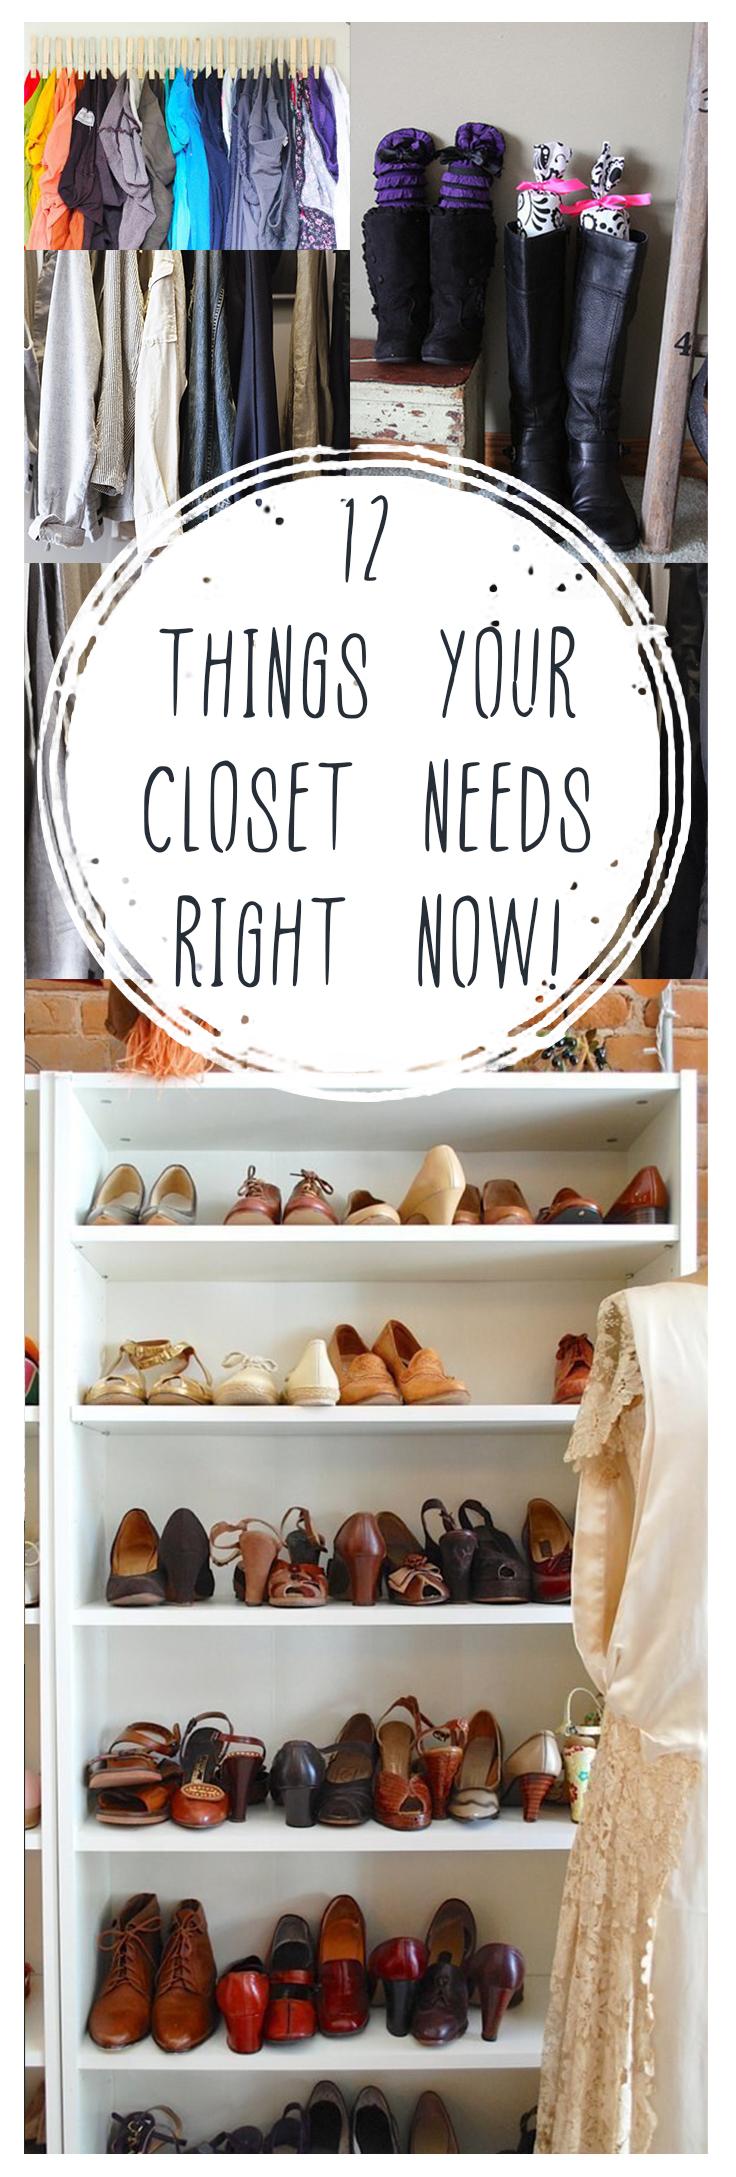 Closet, closet organization ideas, DIY closet organization, popular pin, closet storage, clothing hacks, how to store clothes.